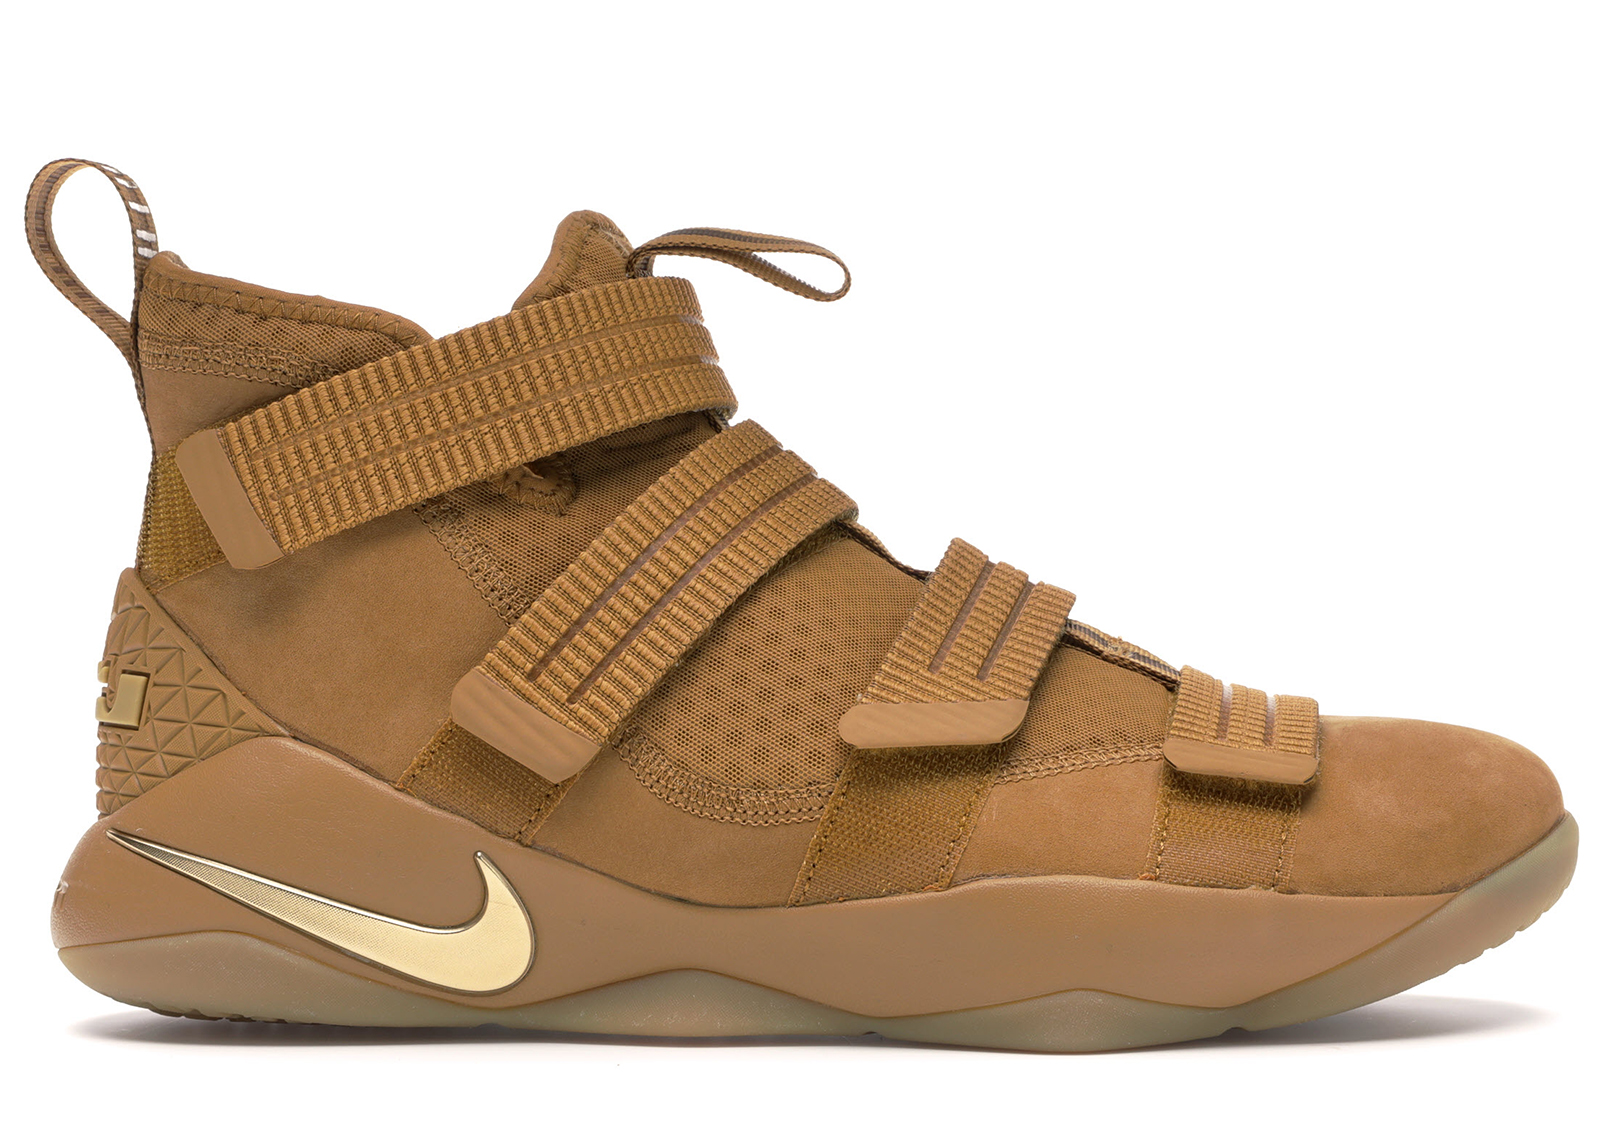 Nike LeBron Zoom Soldier 11 Wheat